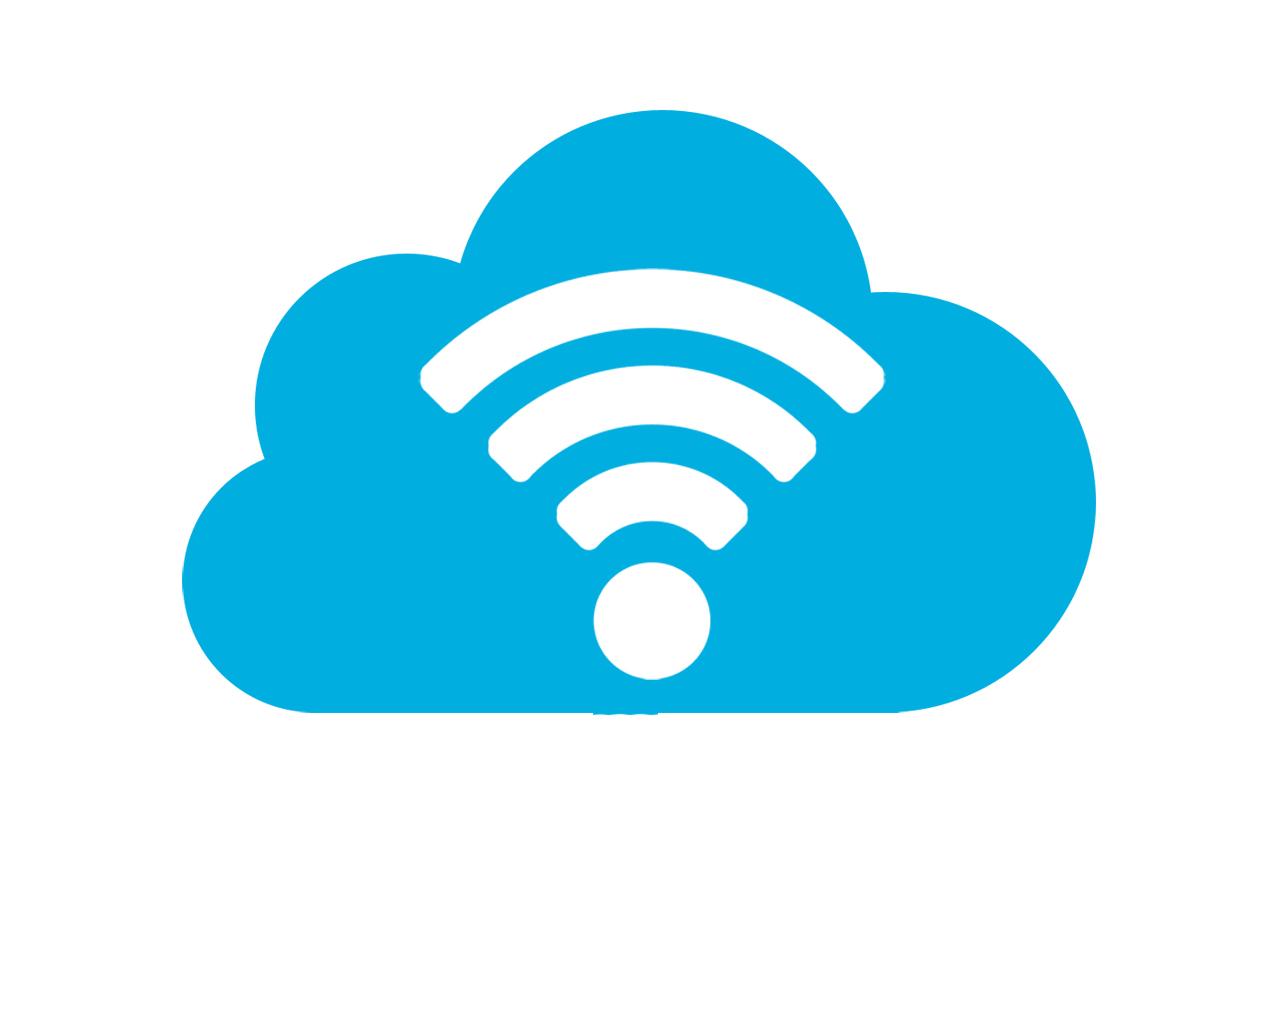 Cloud Icon Image #12858 - Internet Cloud, Transparent background PNG HD thumbnail